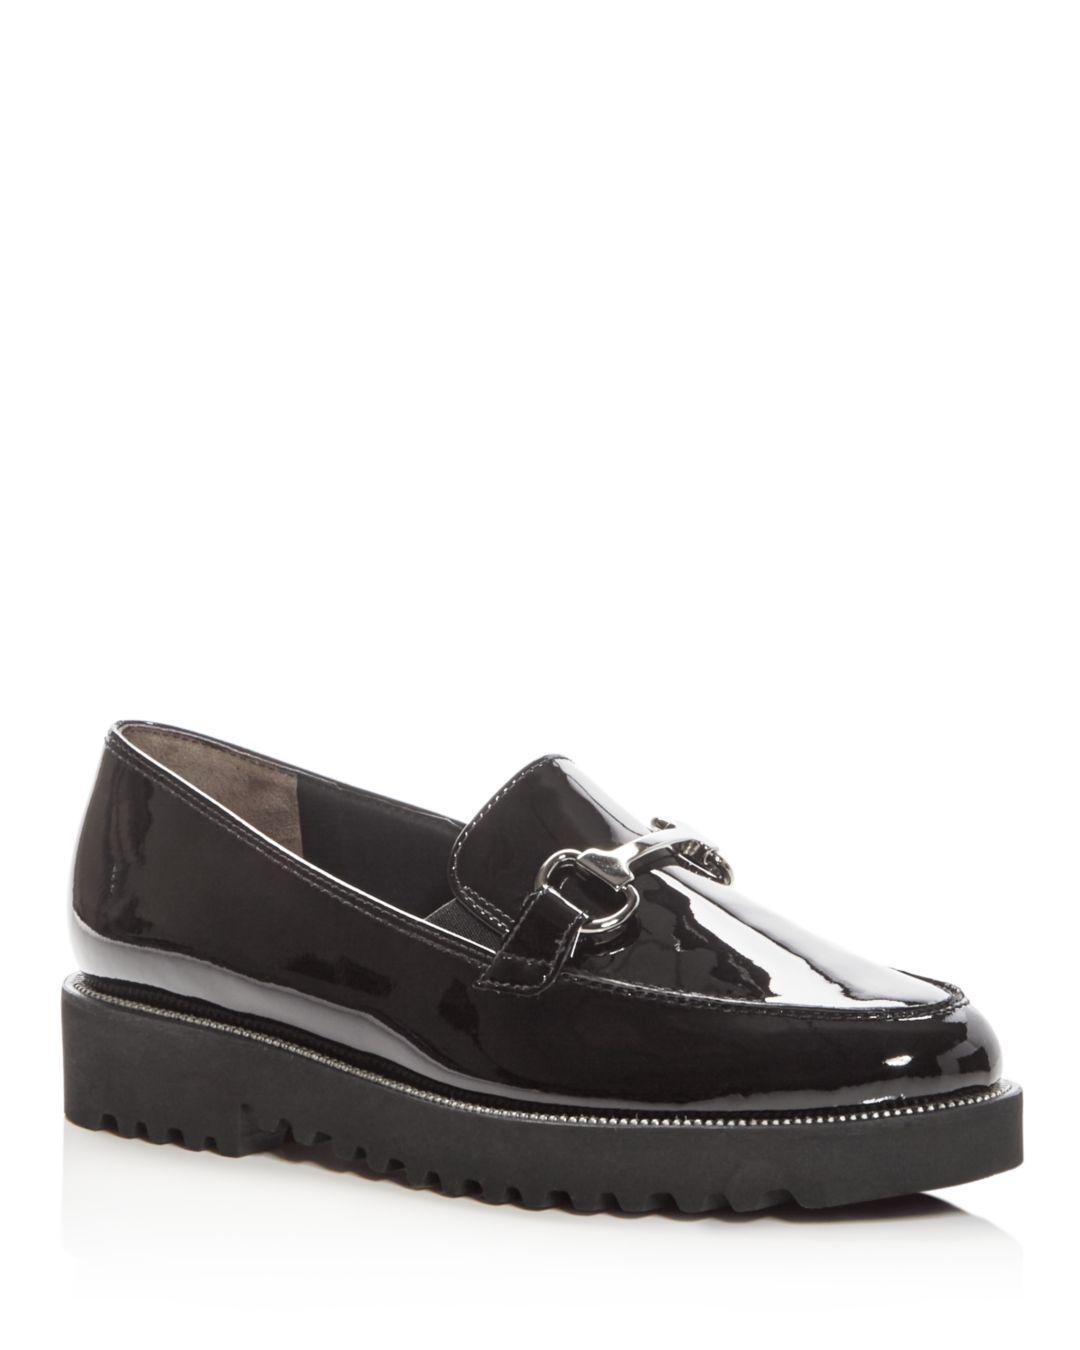 1976d596e67 Lyst - Paul Green Women s Nandi Patent Leather Platform Loafers in Black